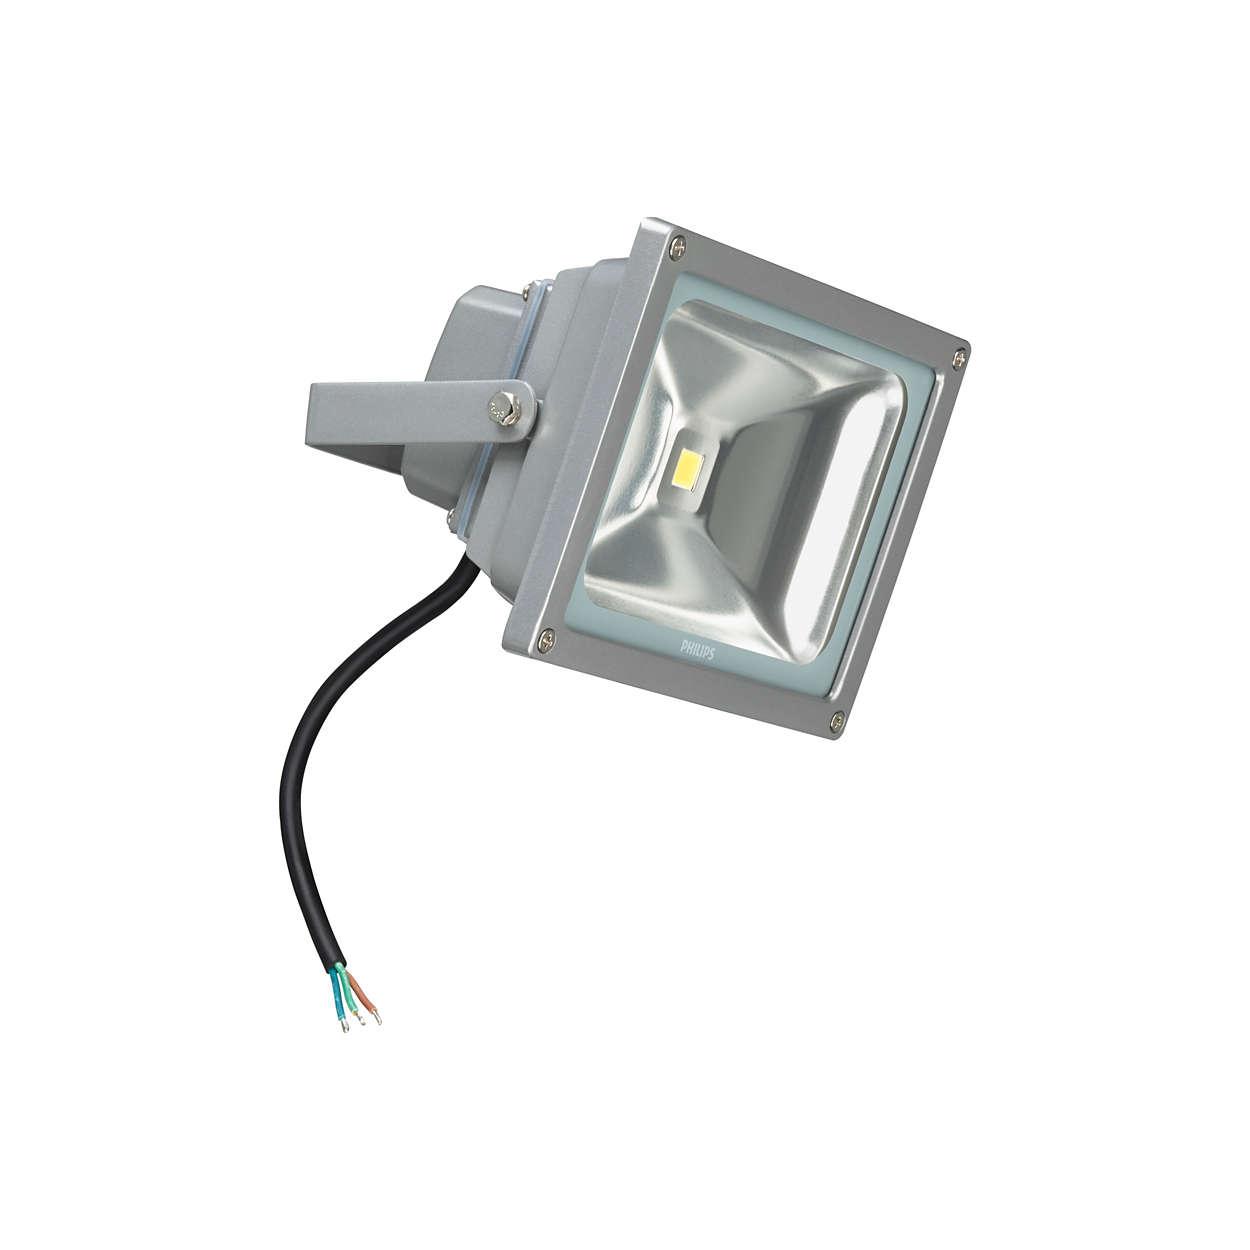 QVF LED – mały kompaktowy projektor LED